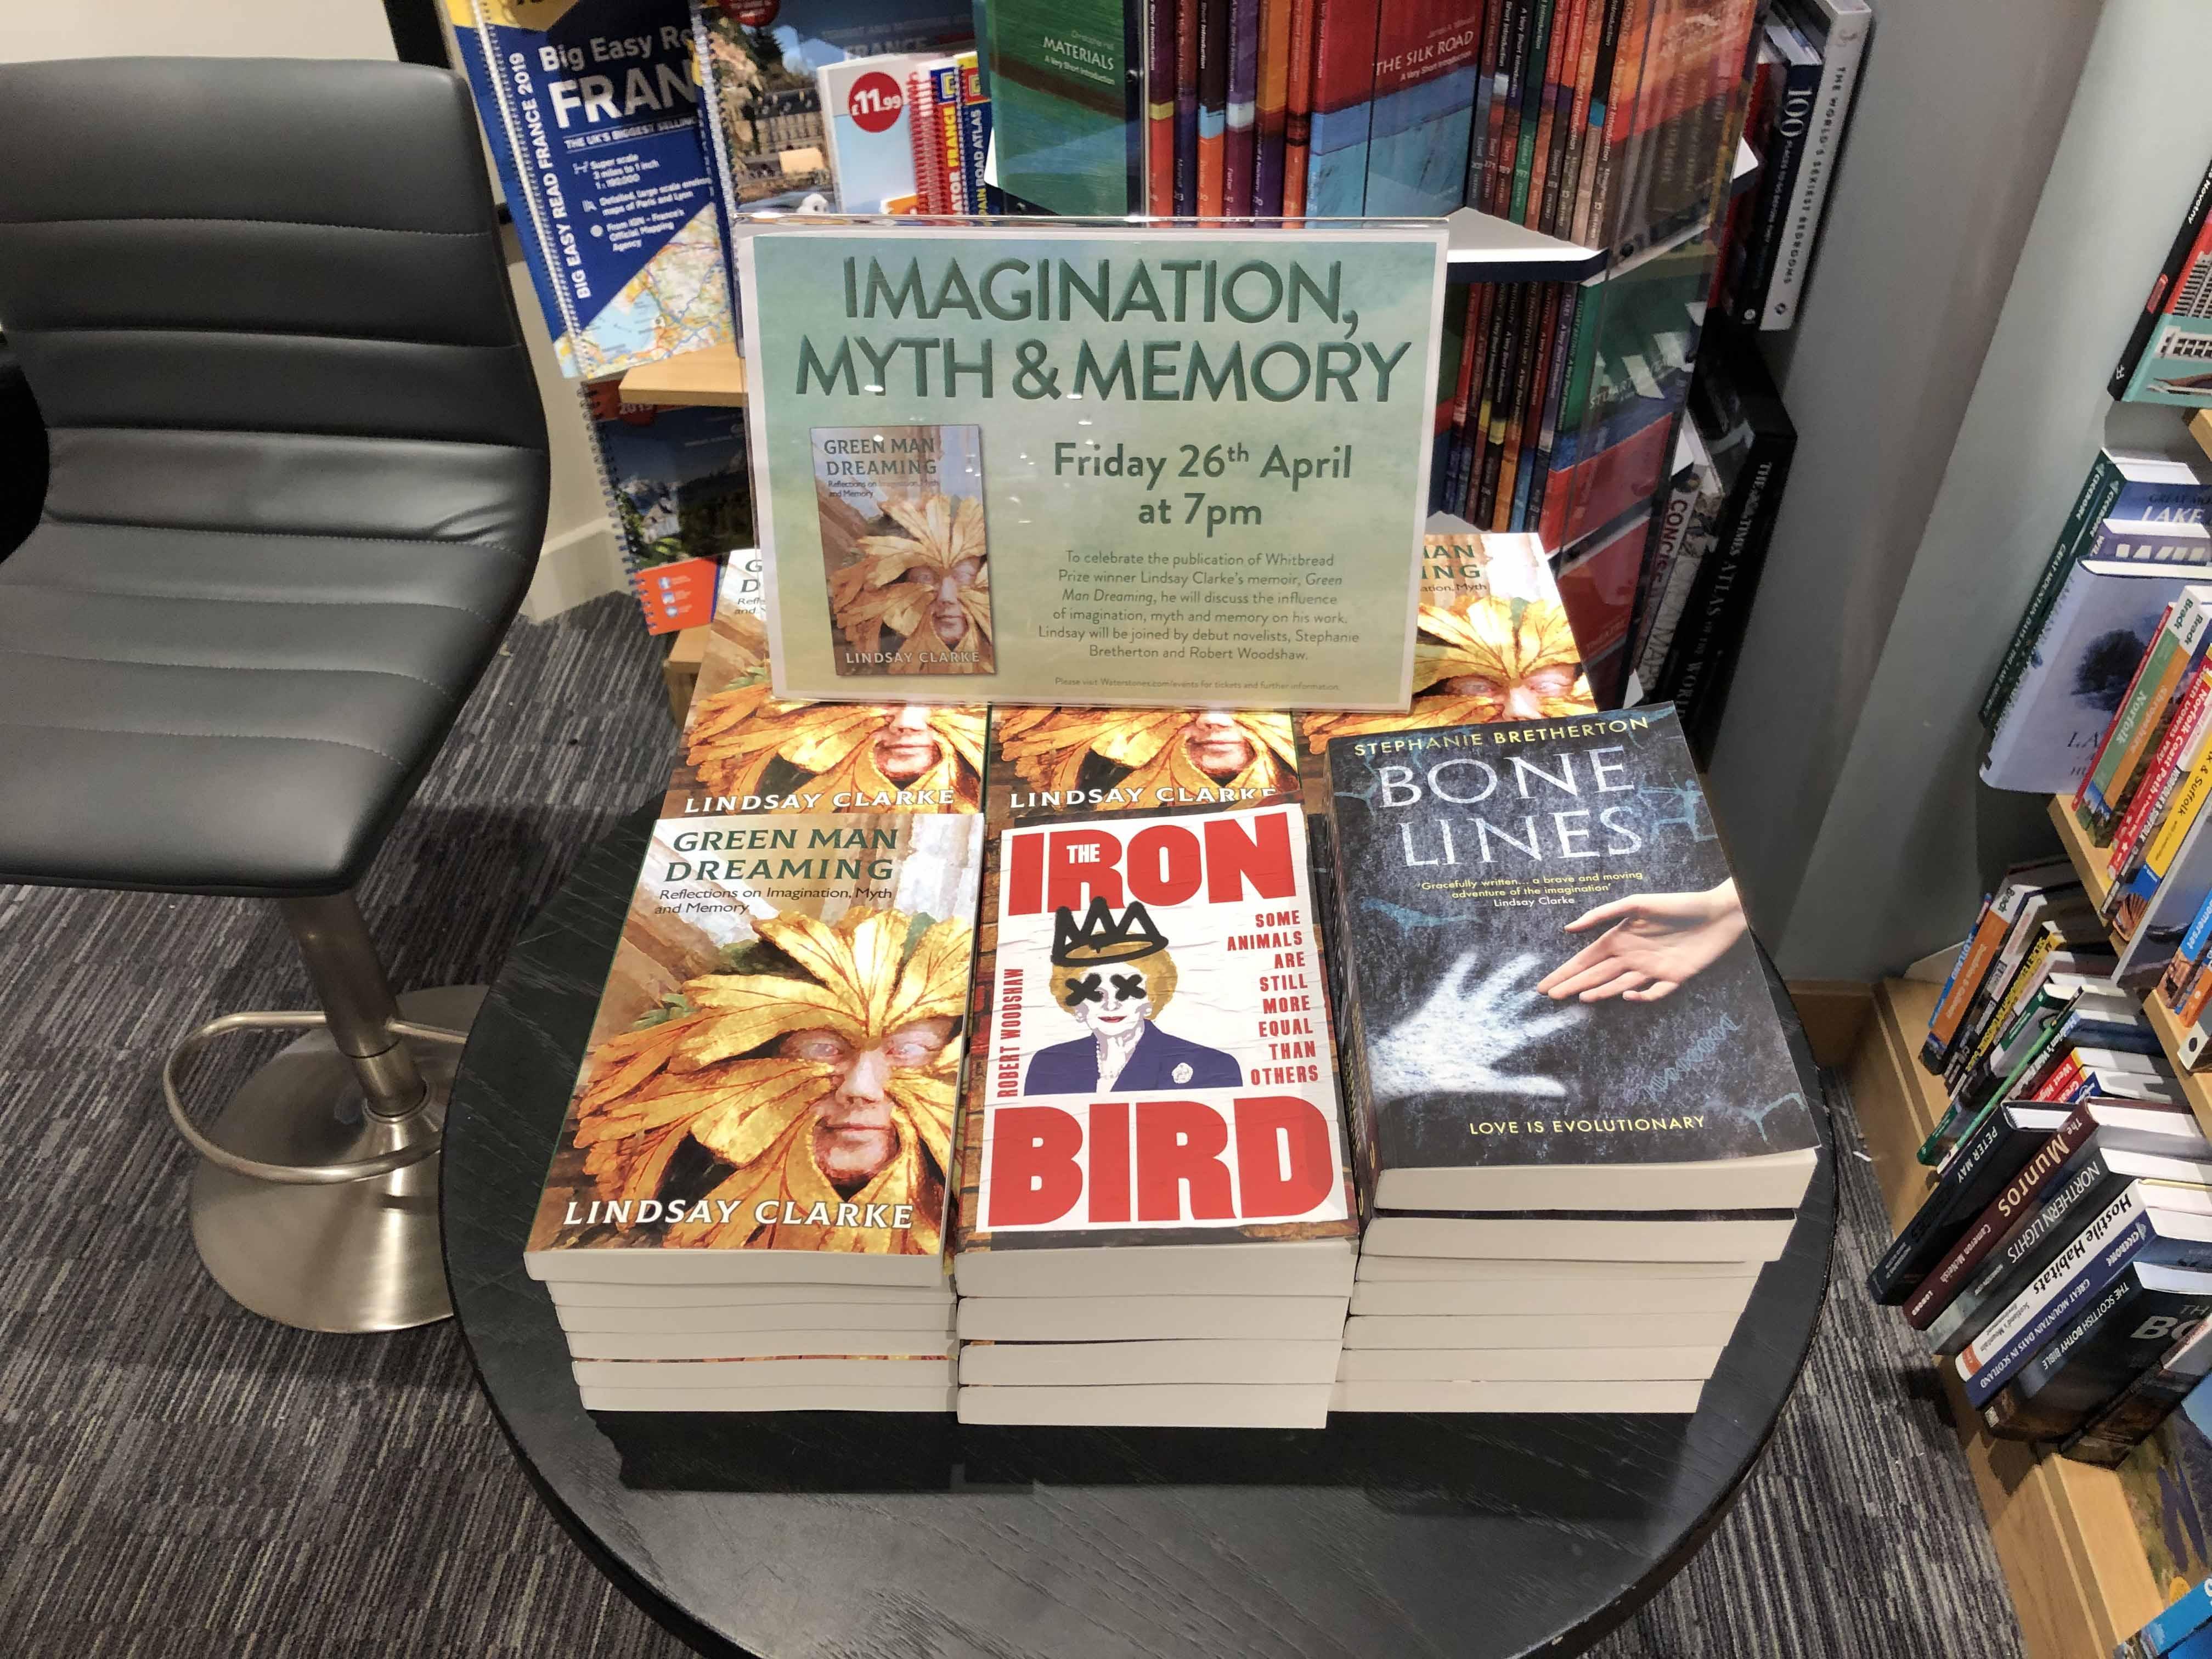 Imagination, Myth & Memory